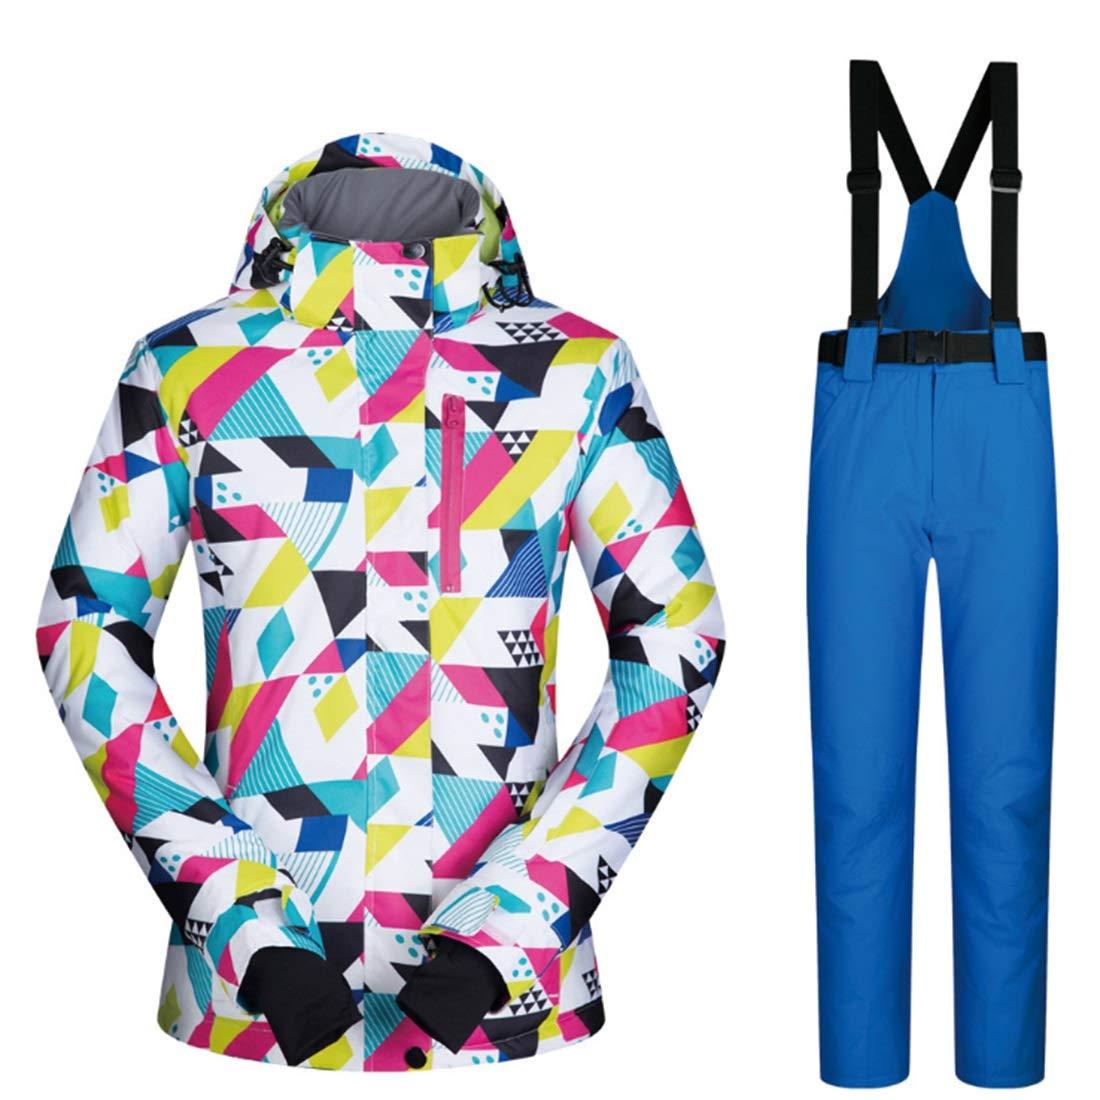 8 XIAMEND Windproof & Waterproof Women Jacket, Outdoor Sport Winter Girl Coat Dress Ski Jacket (color   02, Size   M)